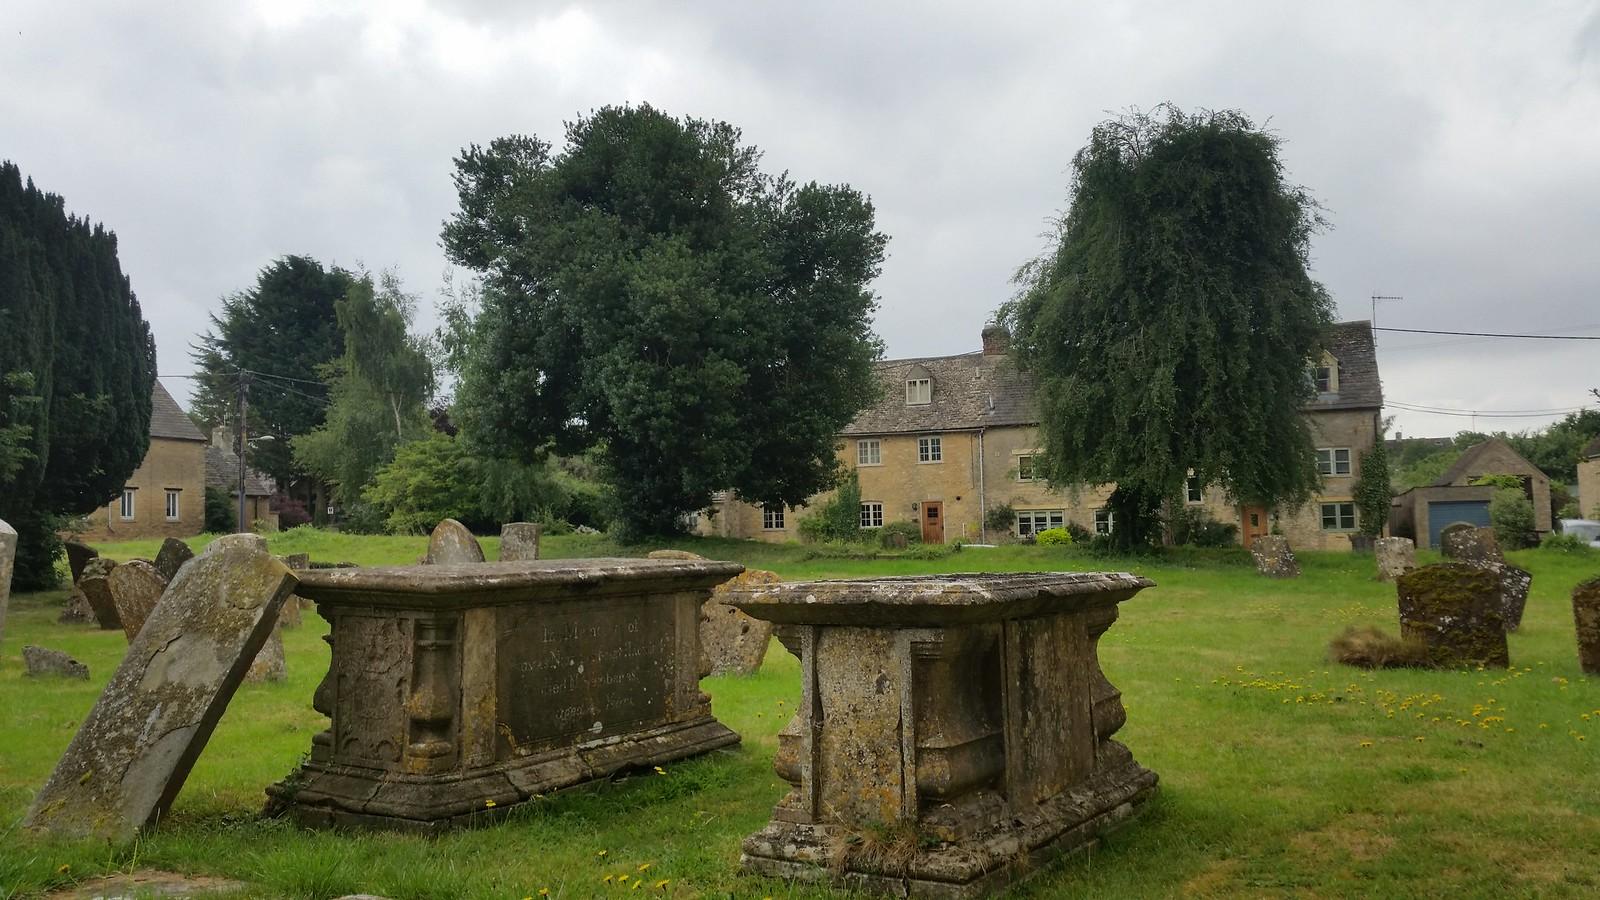 8. Churchyard at Ascott